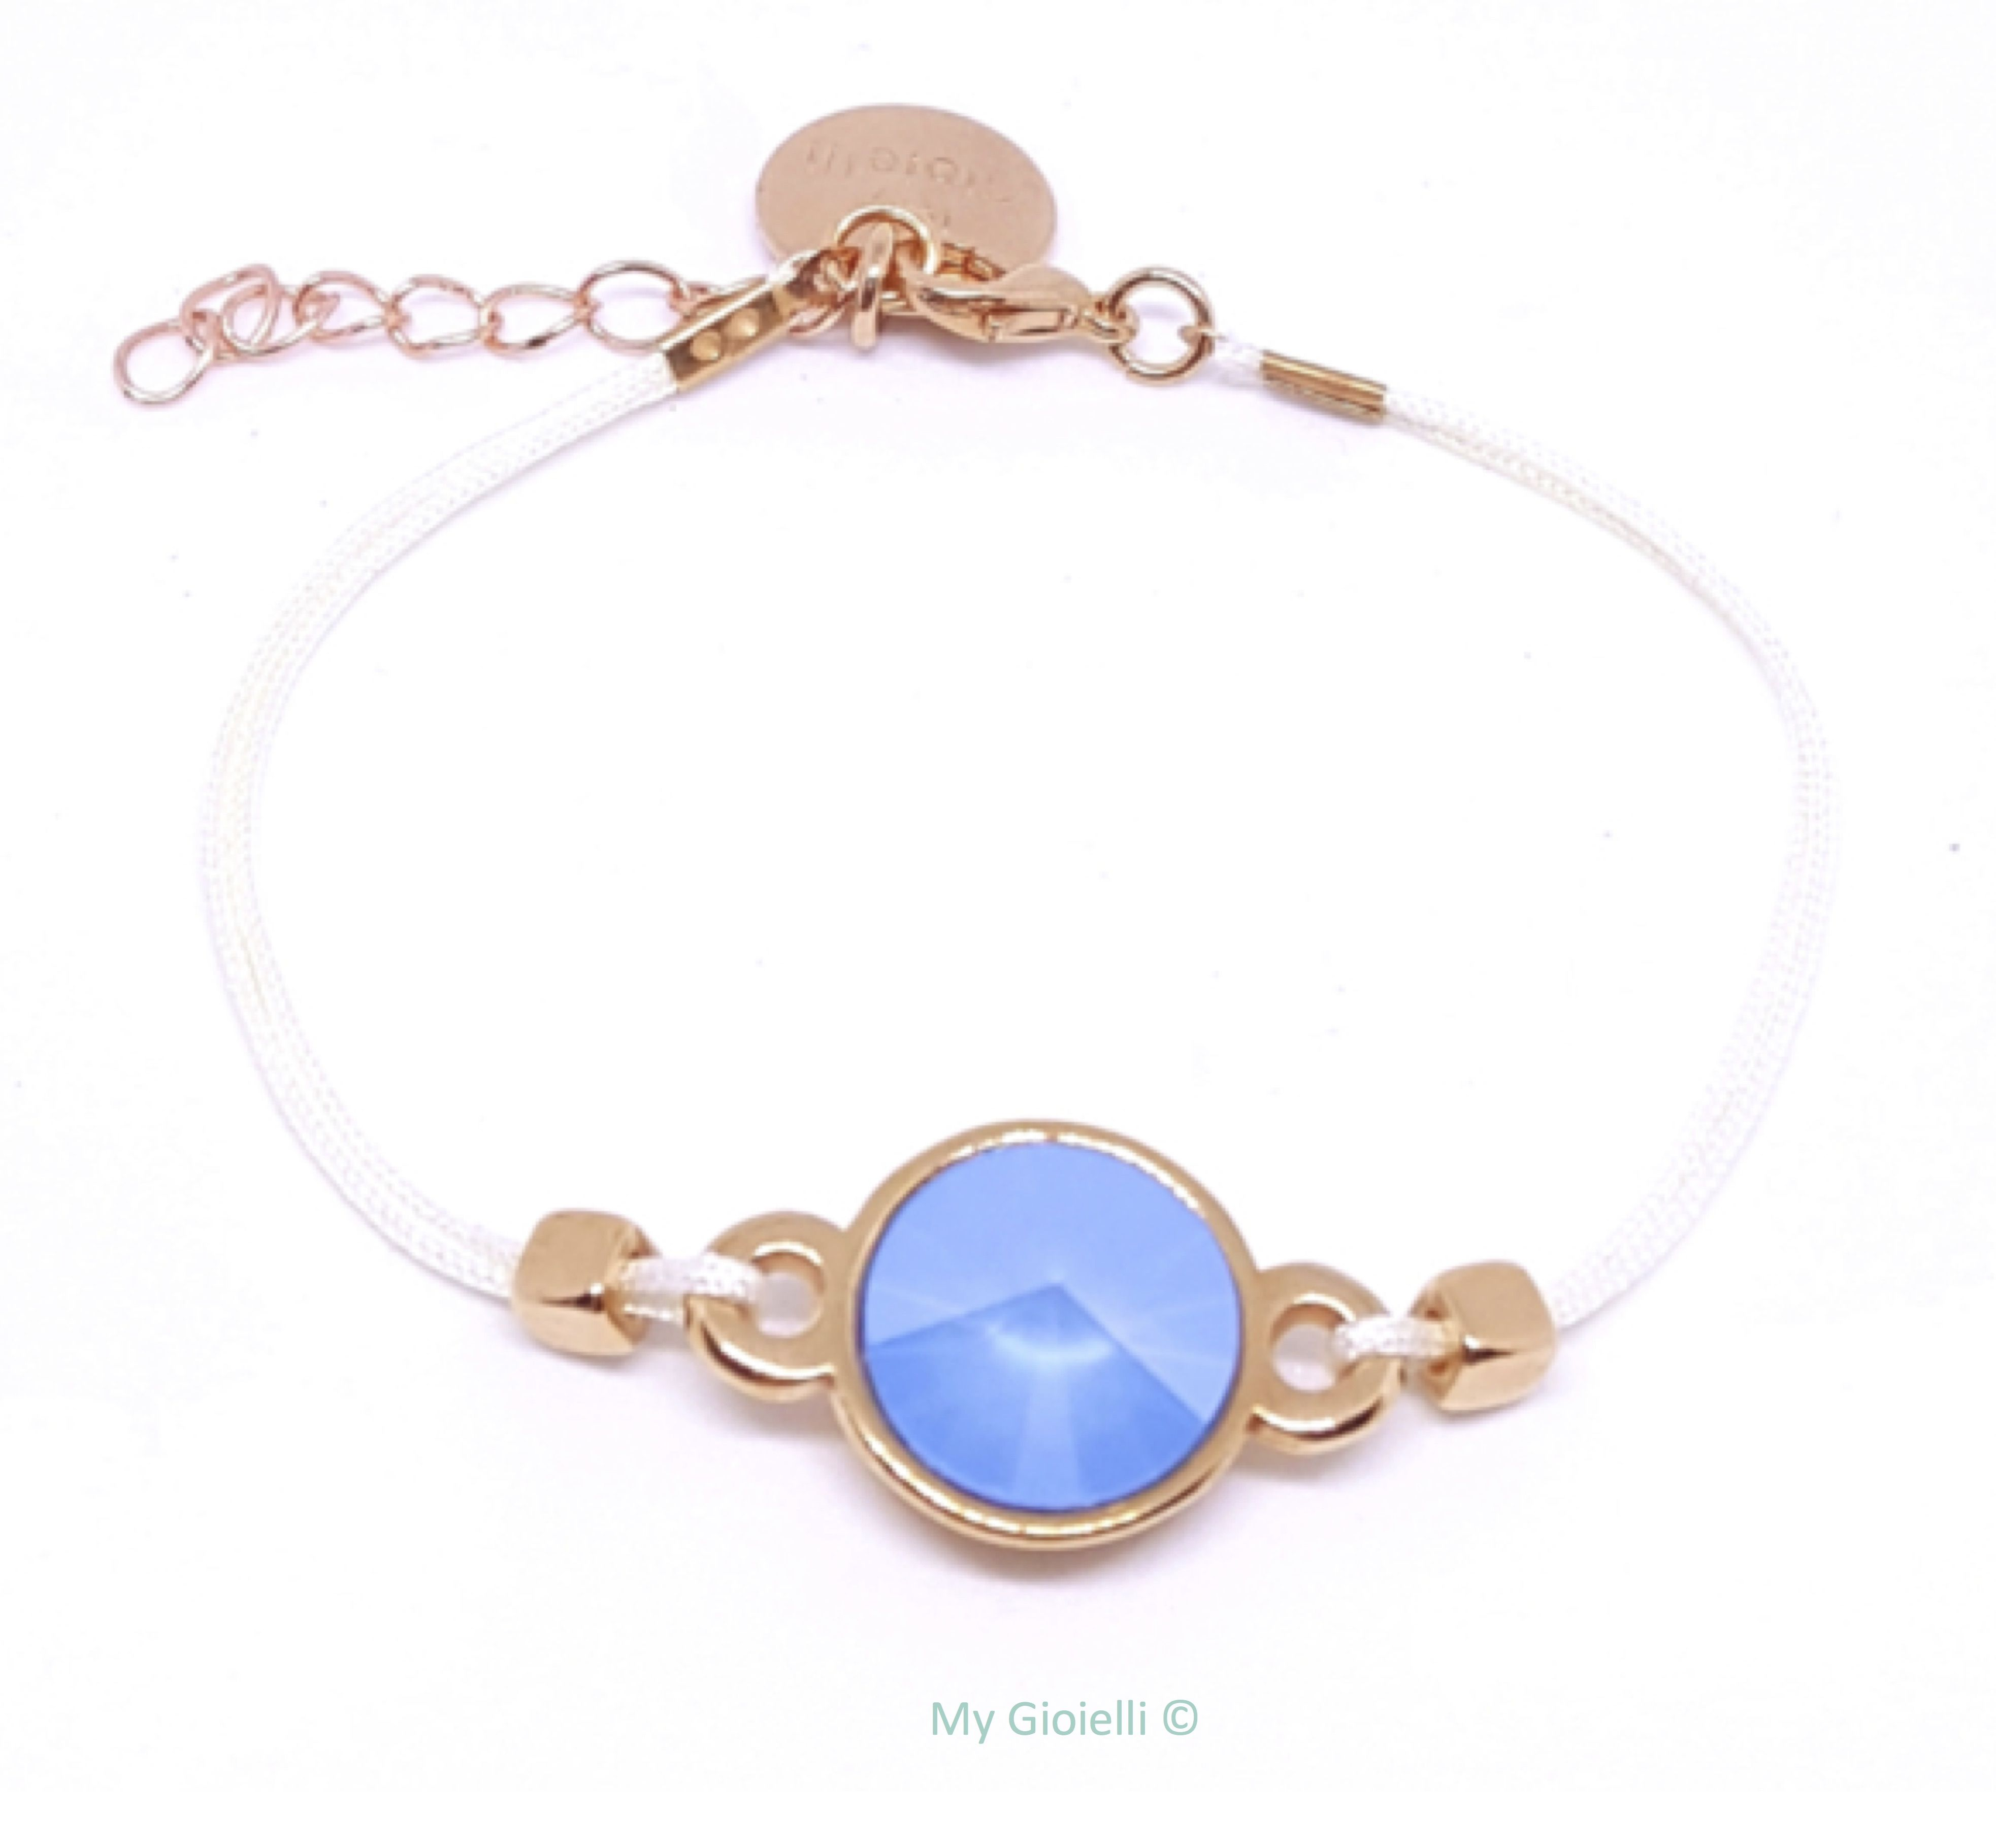 Bracelet swarovski blue rose gold my gioielli my gioielli